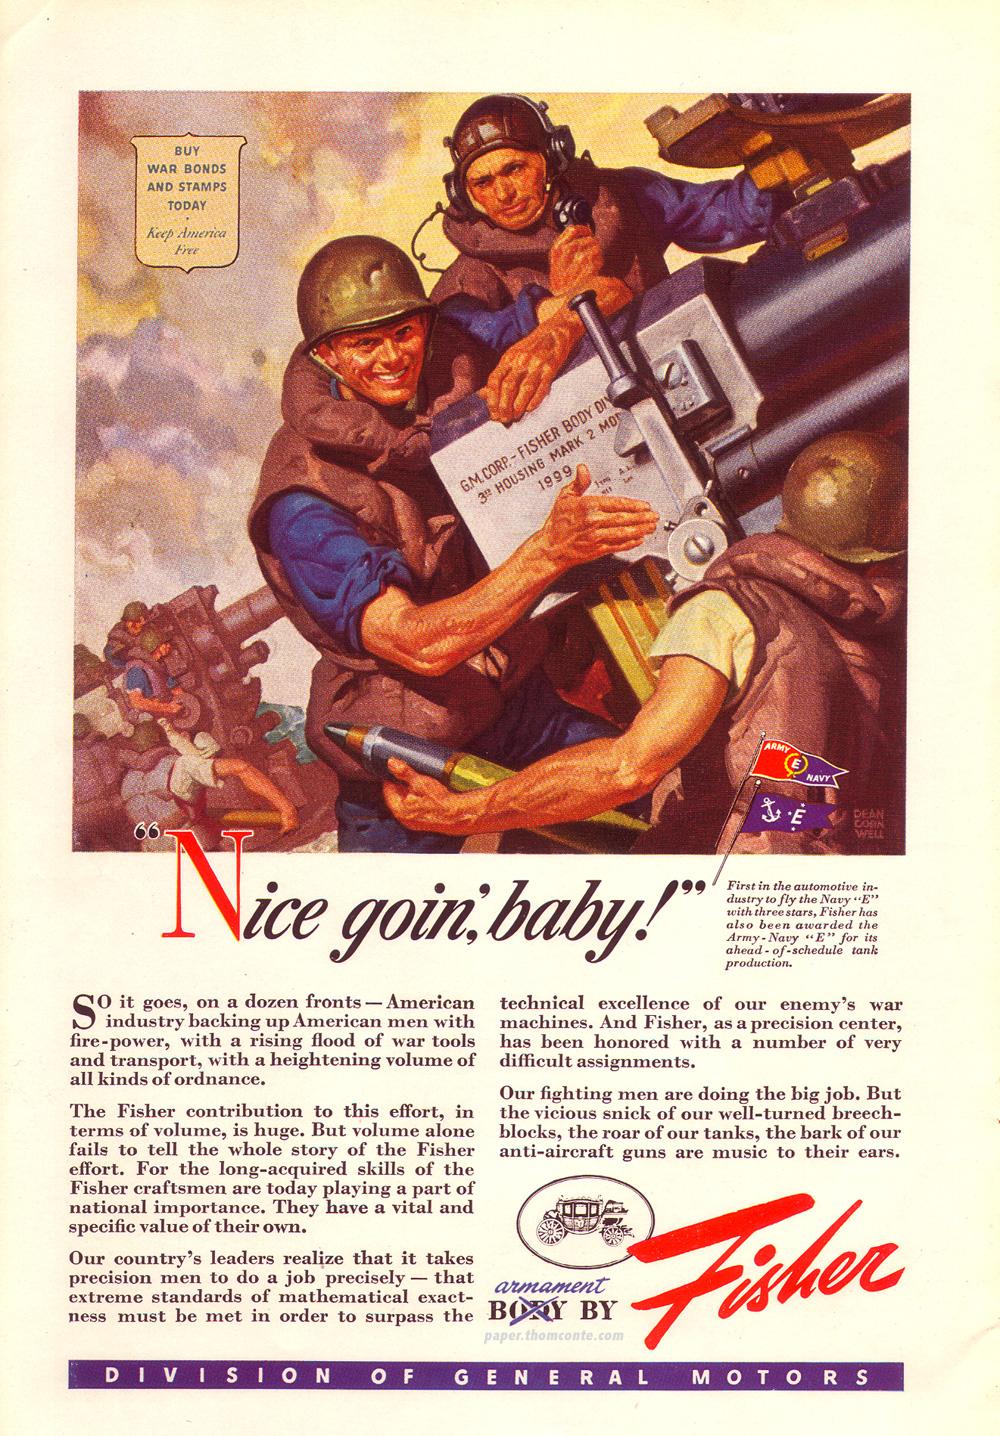 Fisher war advertisement